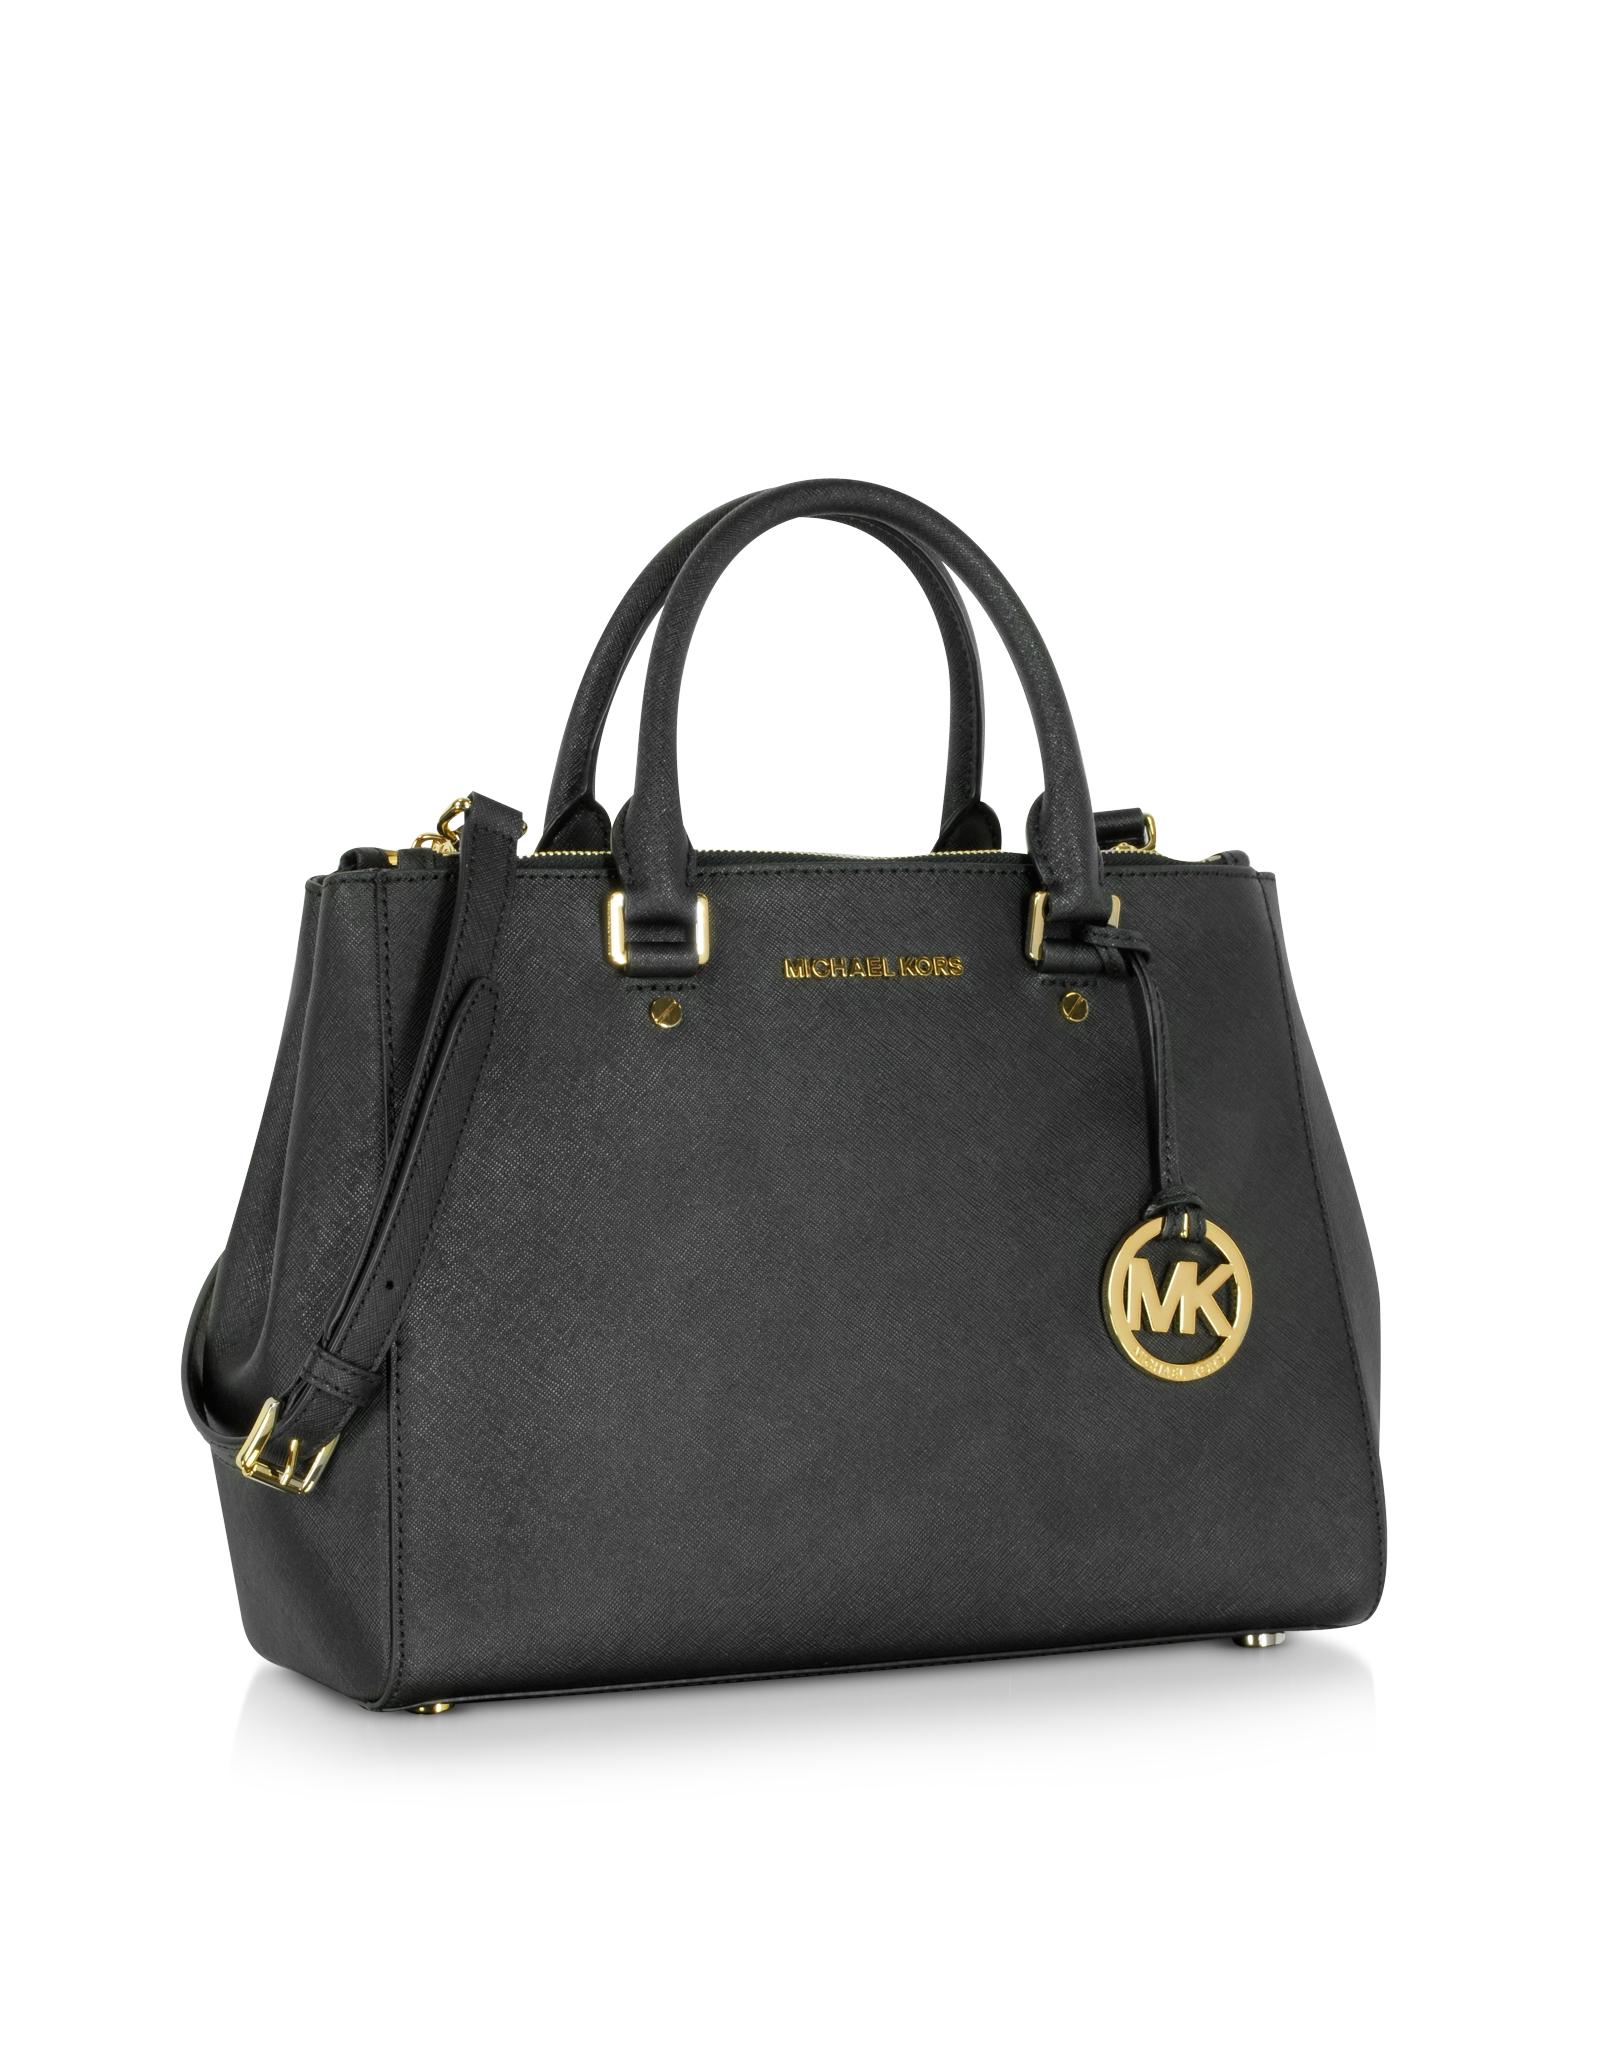 ... canada lyst michael kors sutton medium saffiano leather satchel bag in  black 42dcd 543be 670684779ff1b